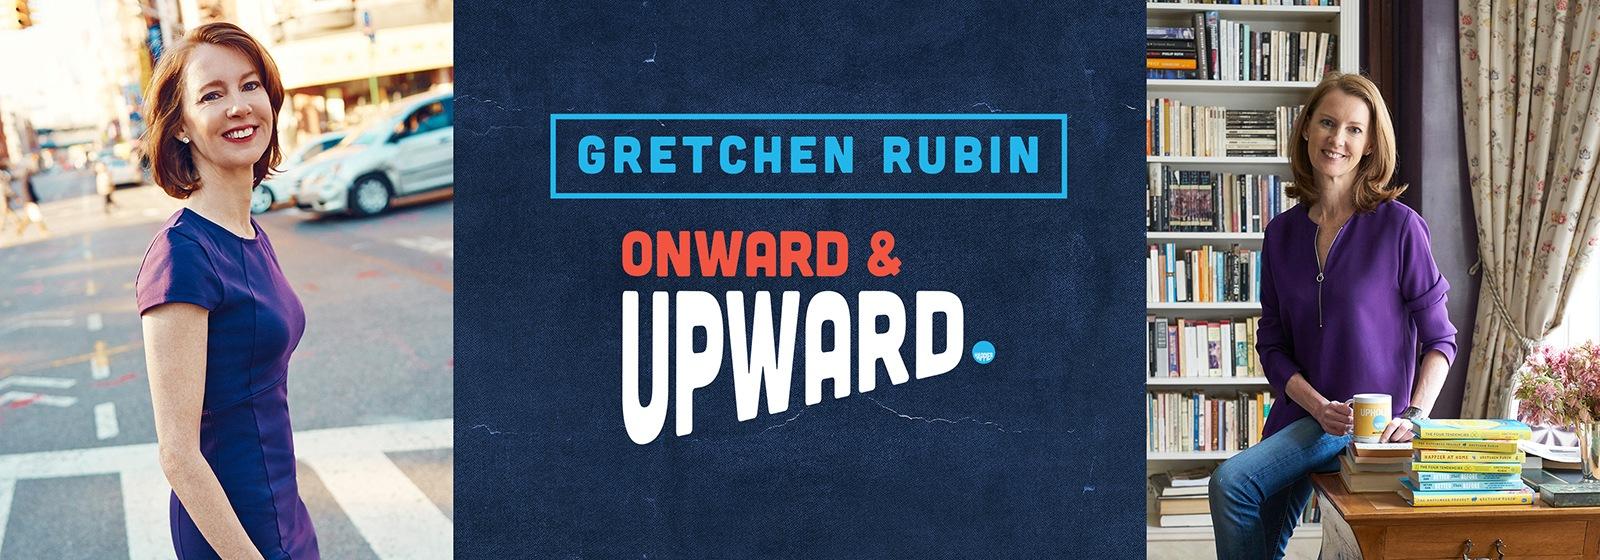 Gretchen Rubin Store